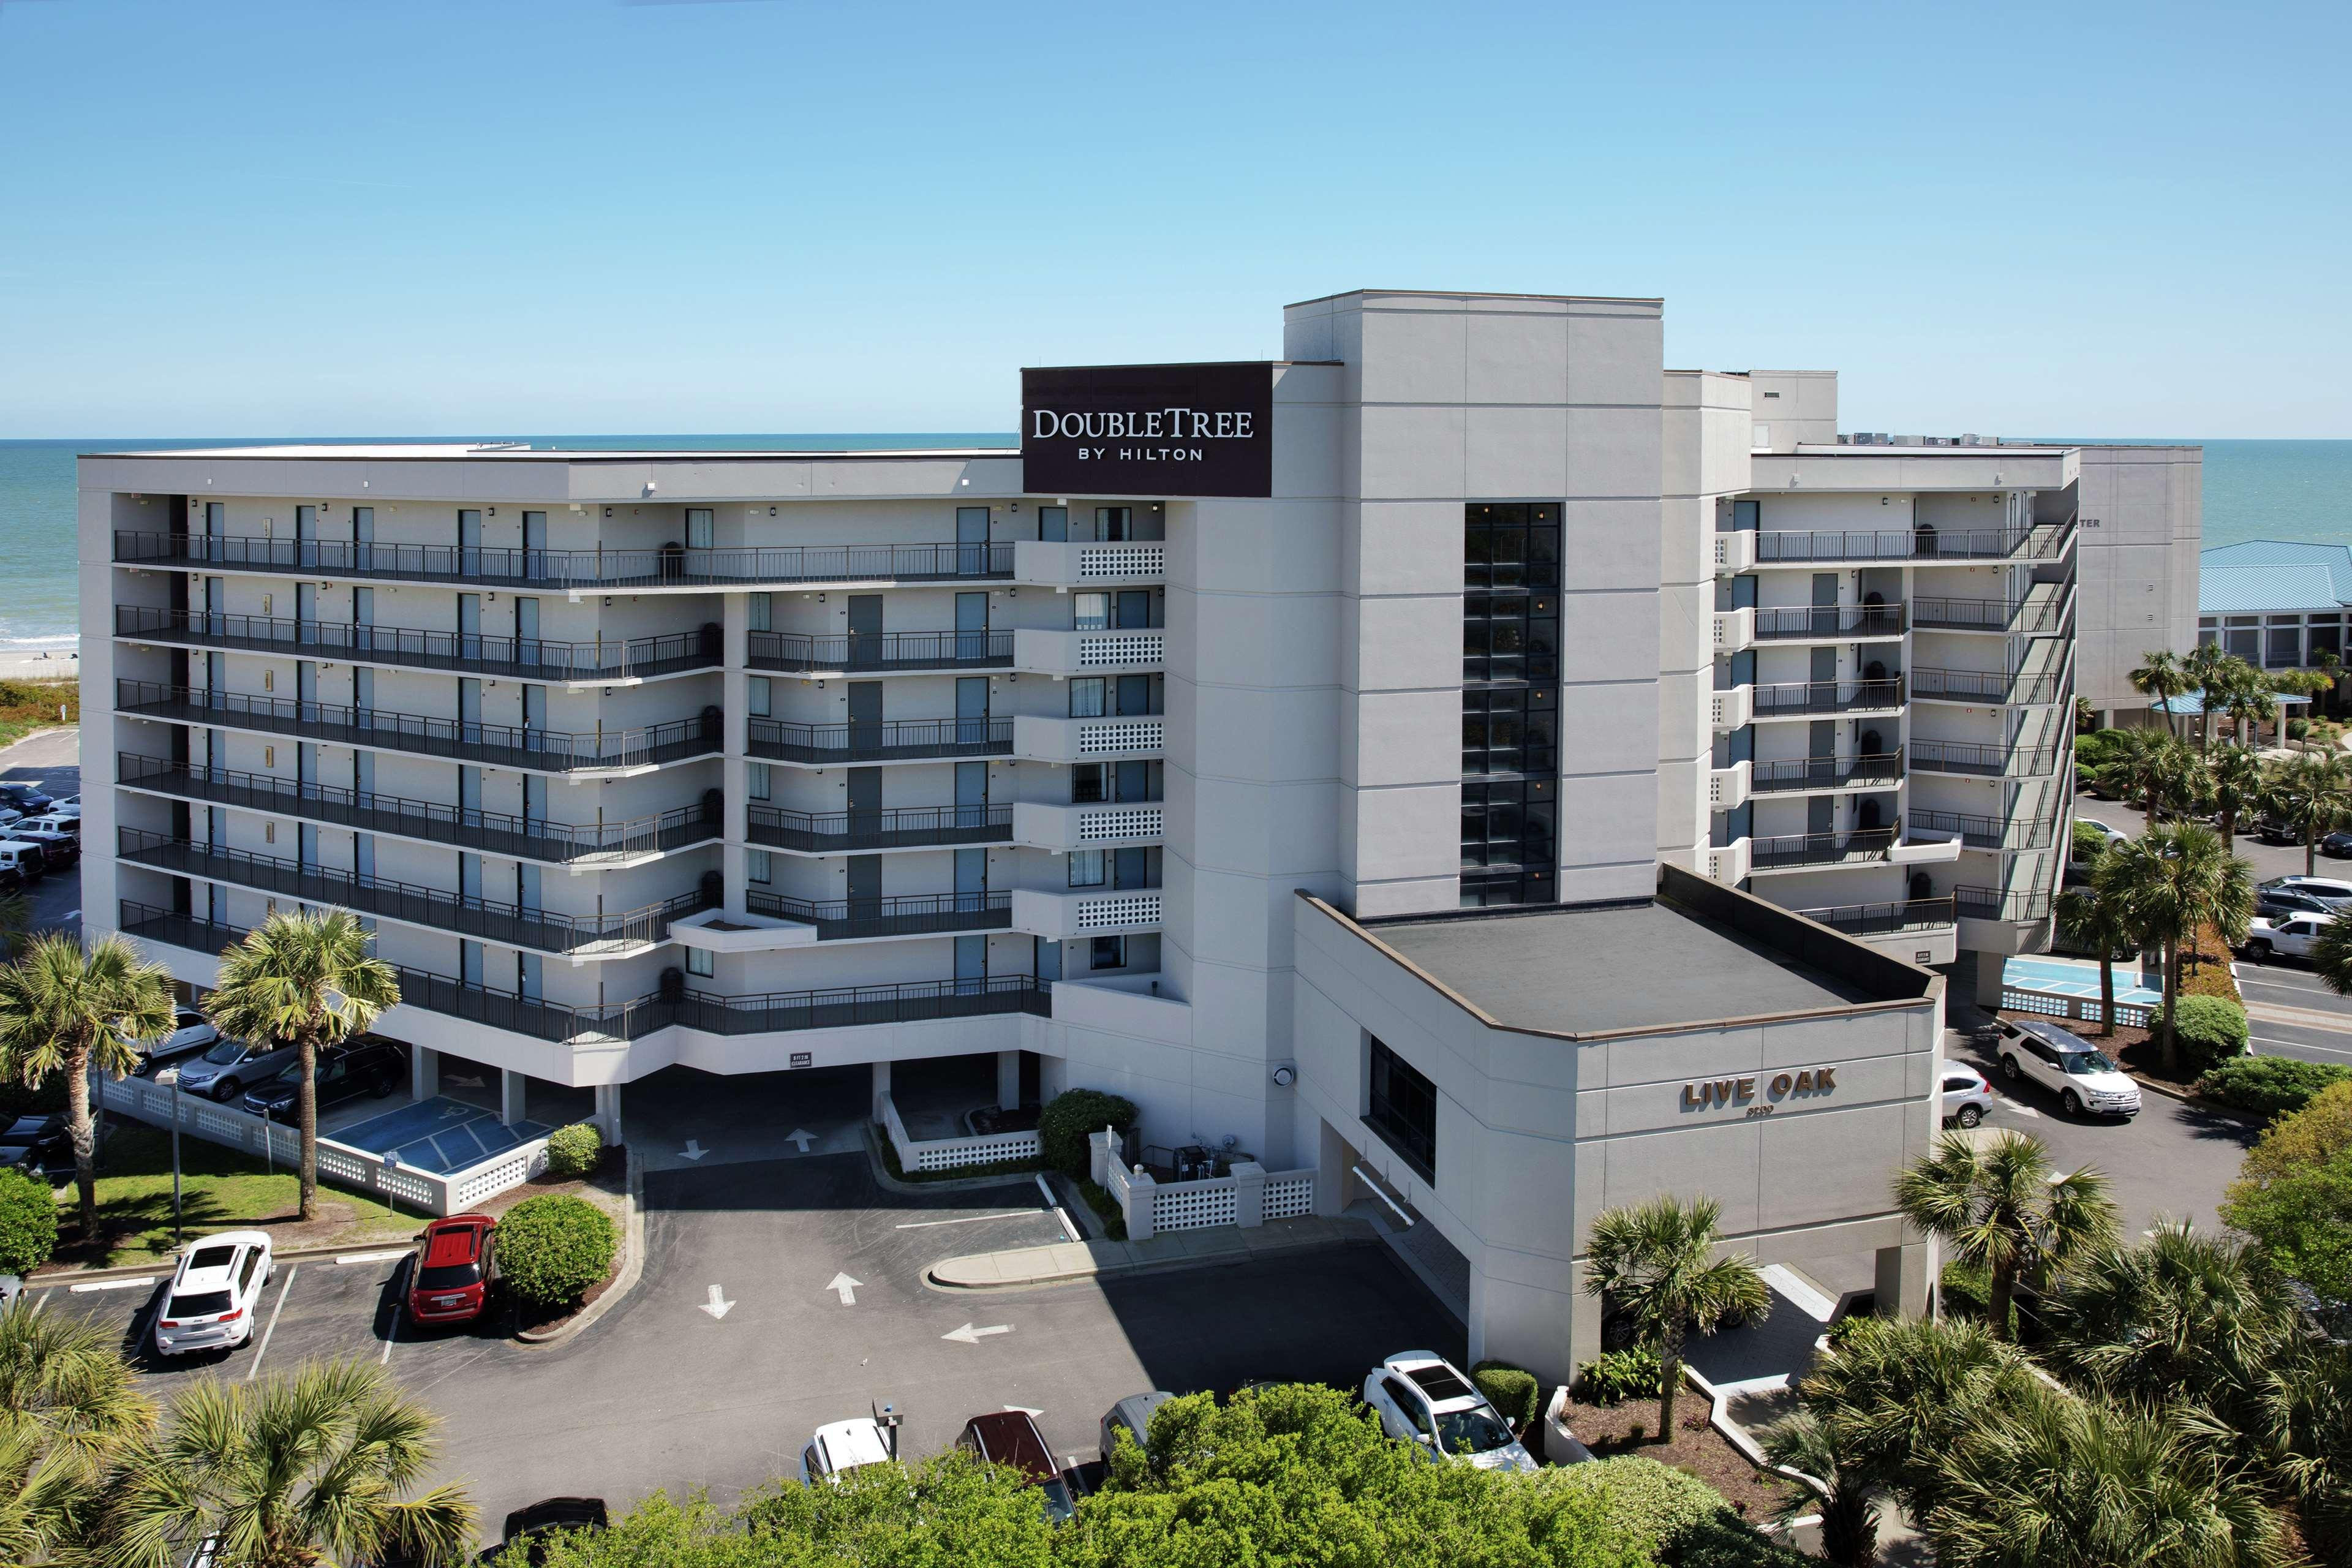 DoubleTree Resort by Hilton Myrtle Beach, Georgetown